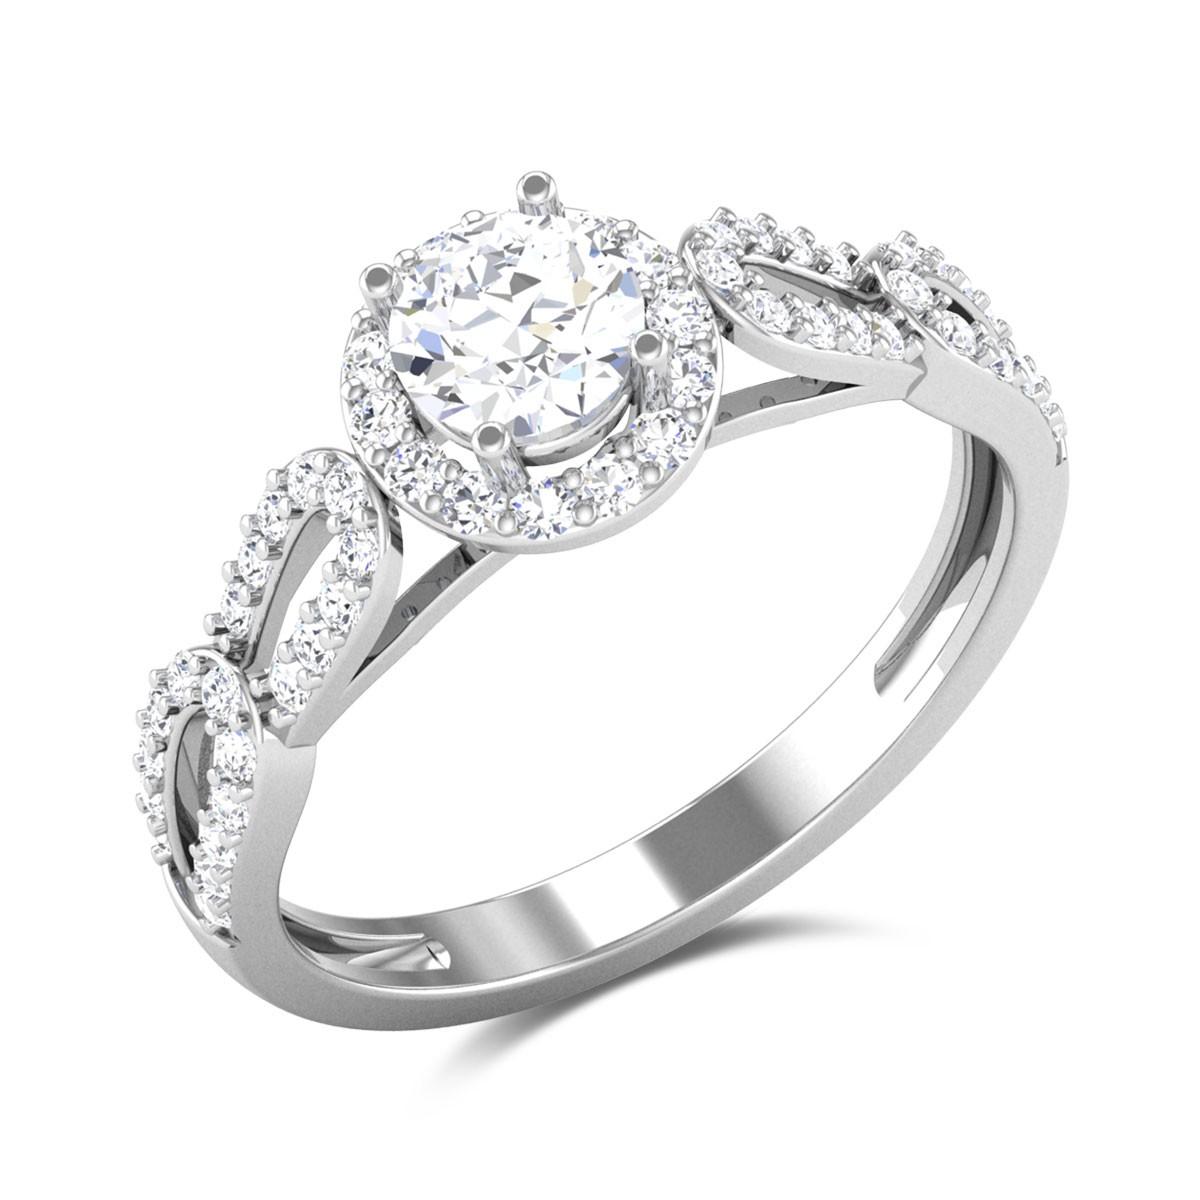 Sitara Solitaire Ring